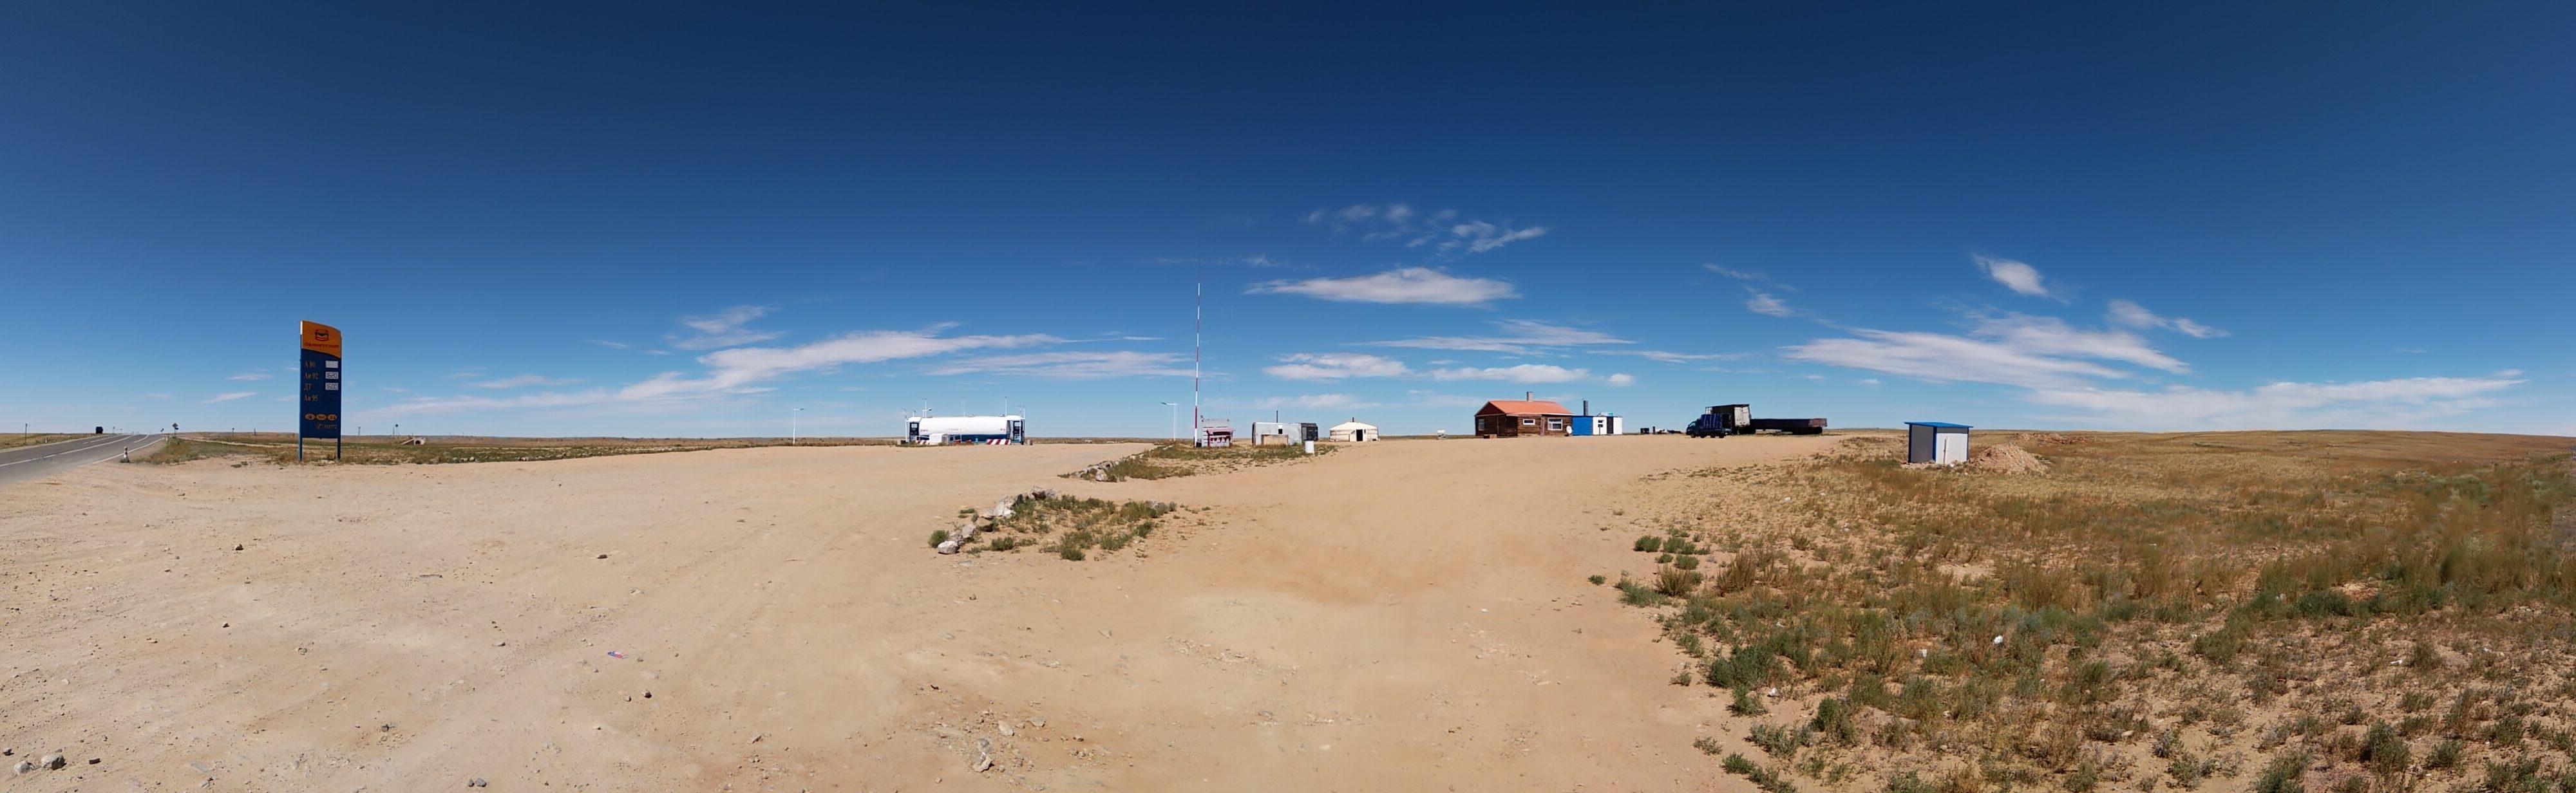 km 107 - gas station